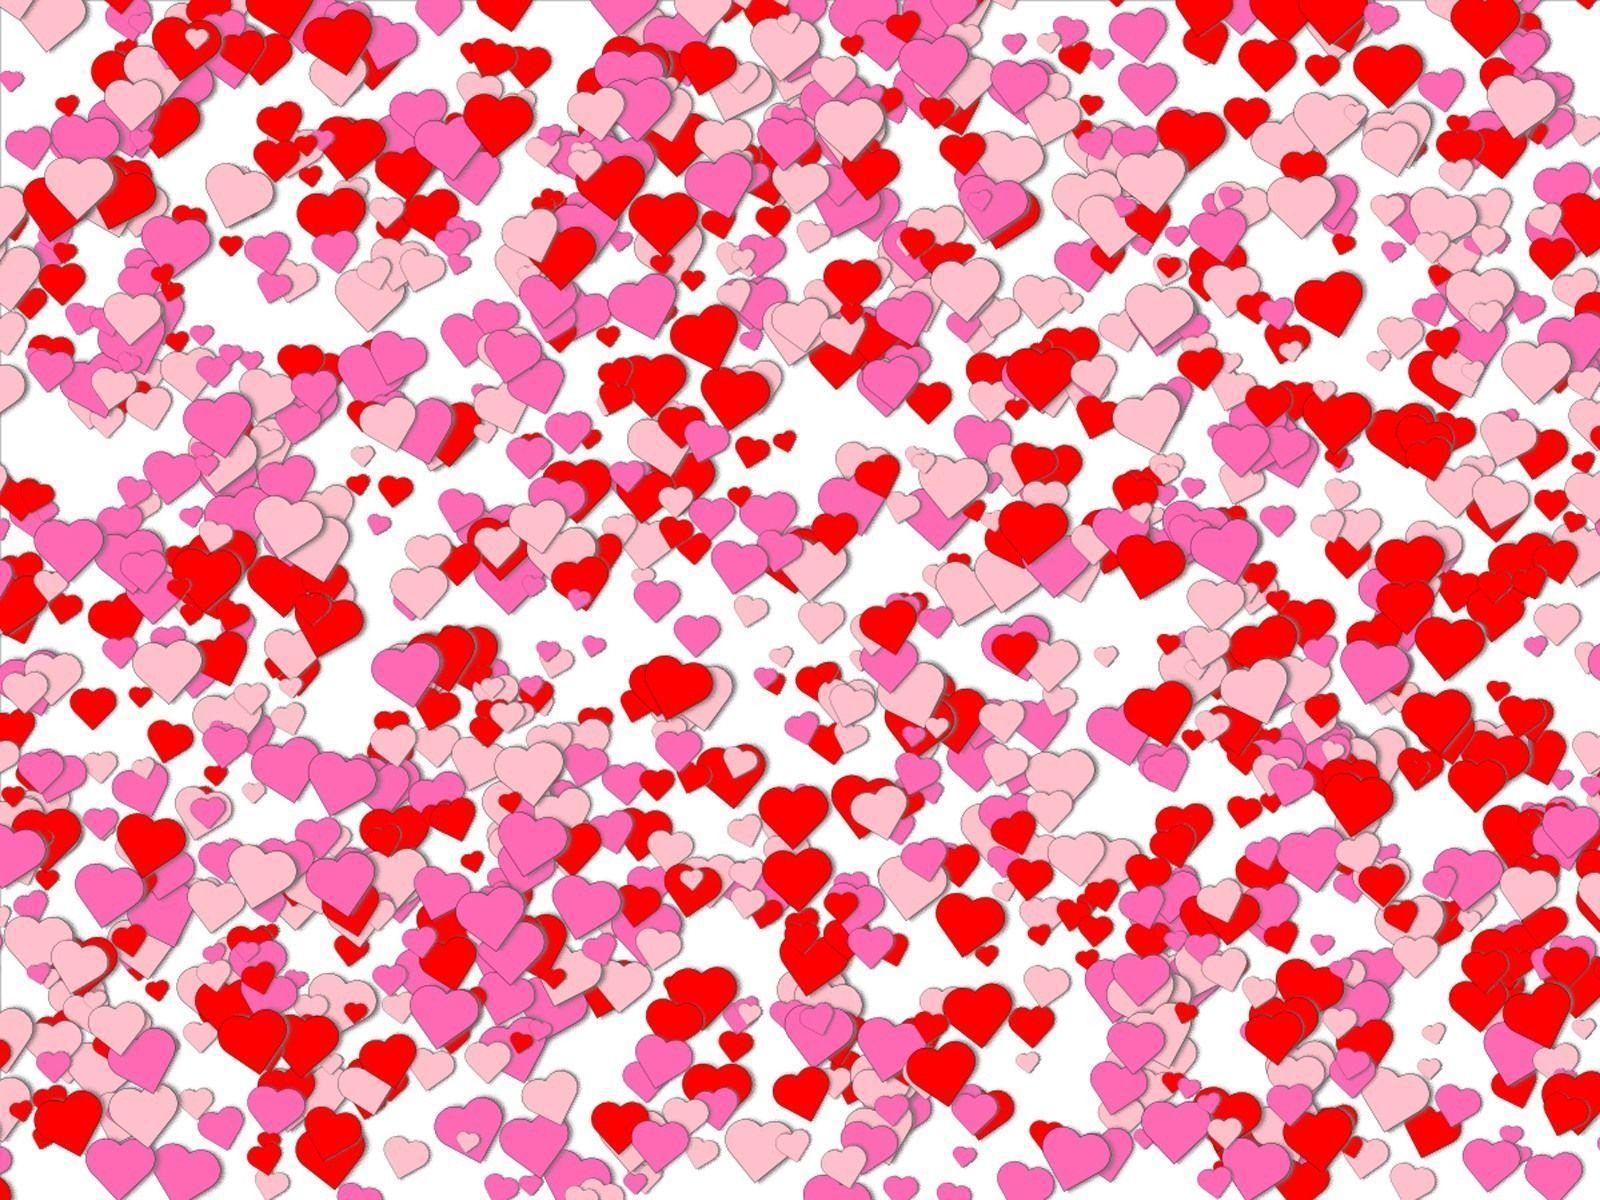 Heart Desktop Backgrounds - Wallpaper Cave